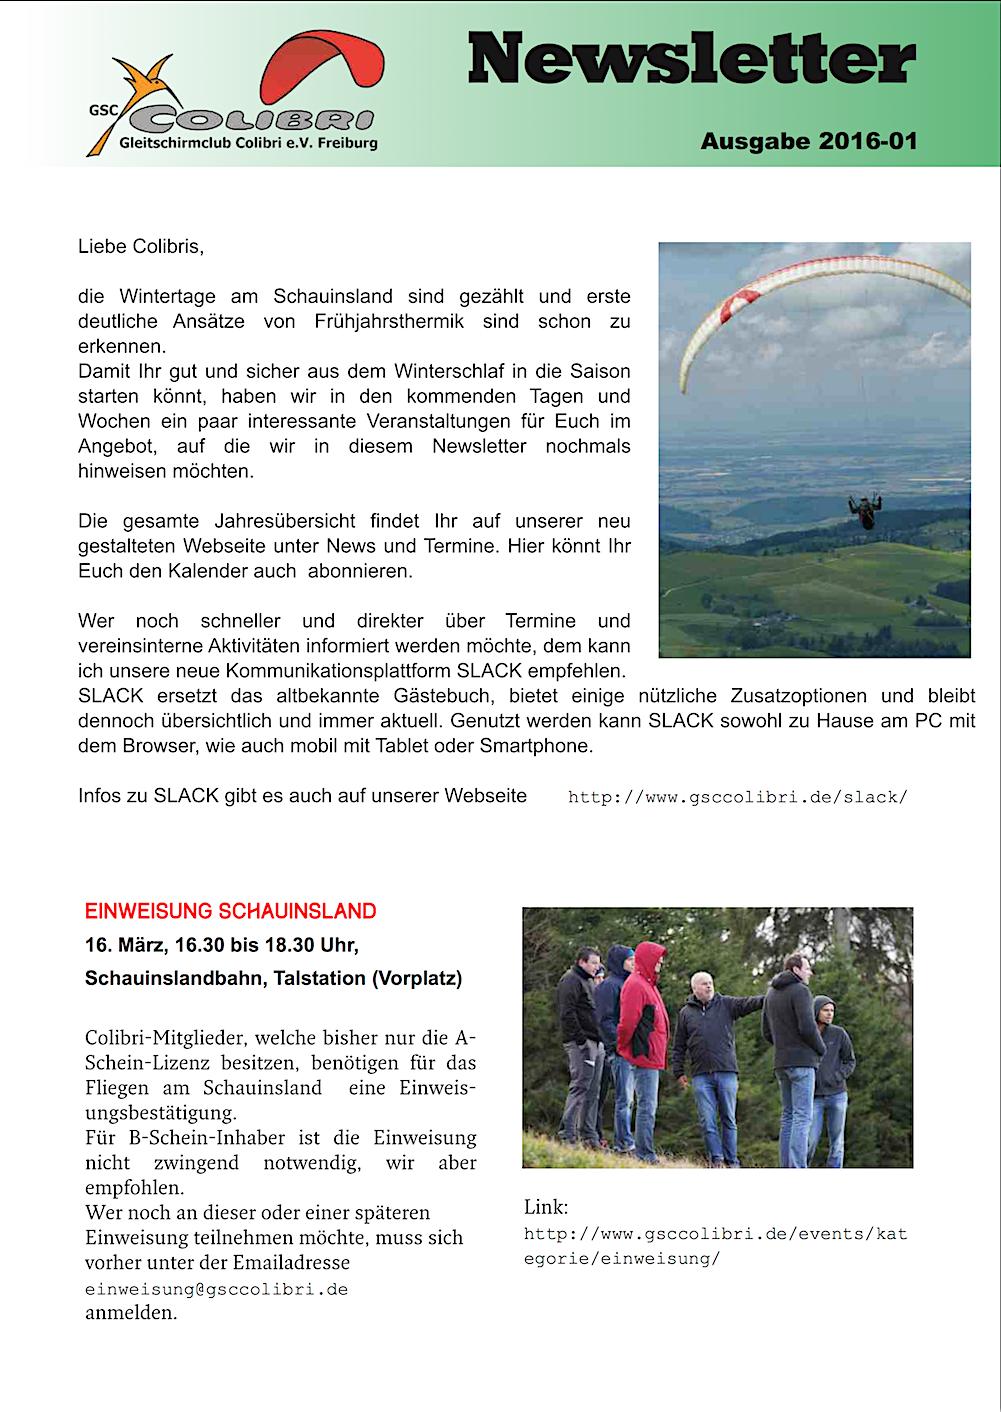 Colibri Newsletter 2016_01